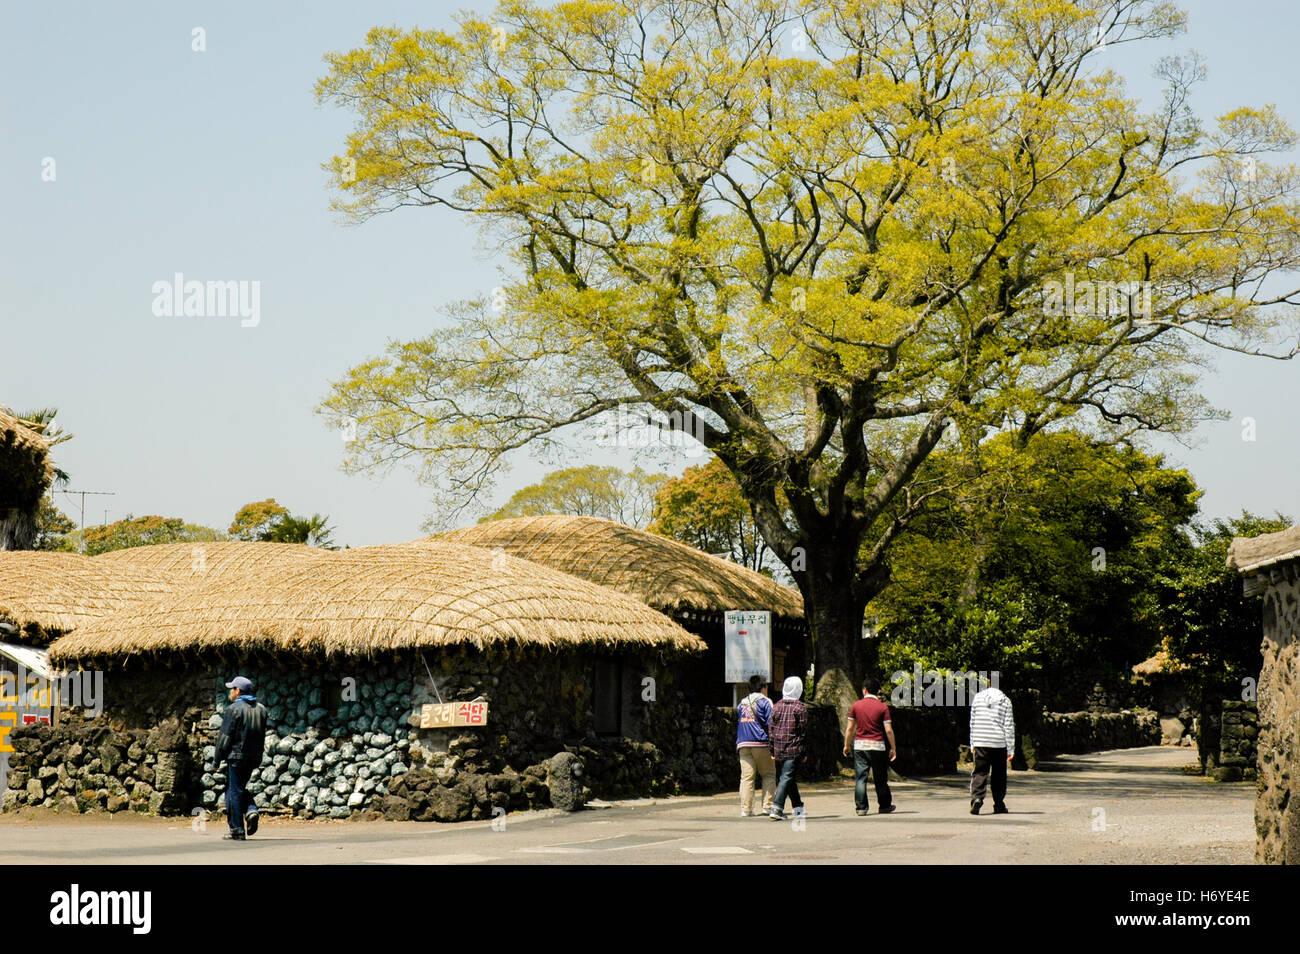 seongeup folk village. jeju. sth korea - Stock Image